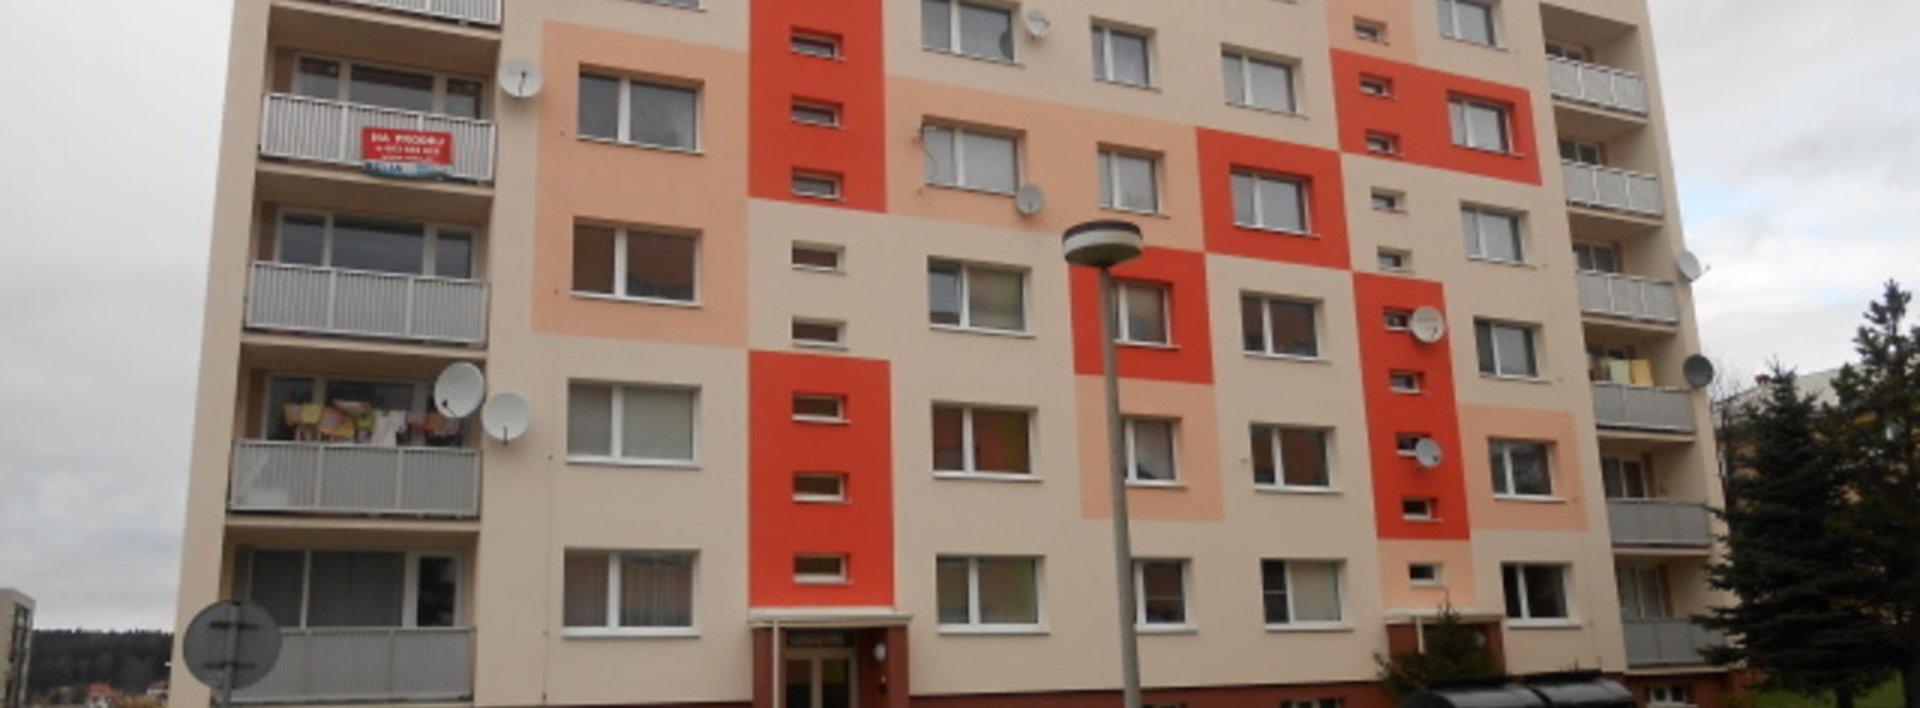 Prodej zrekonstruovaného bytu 3+1, Ev.č.: N46518